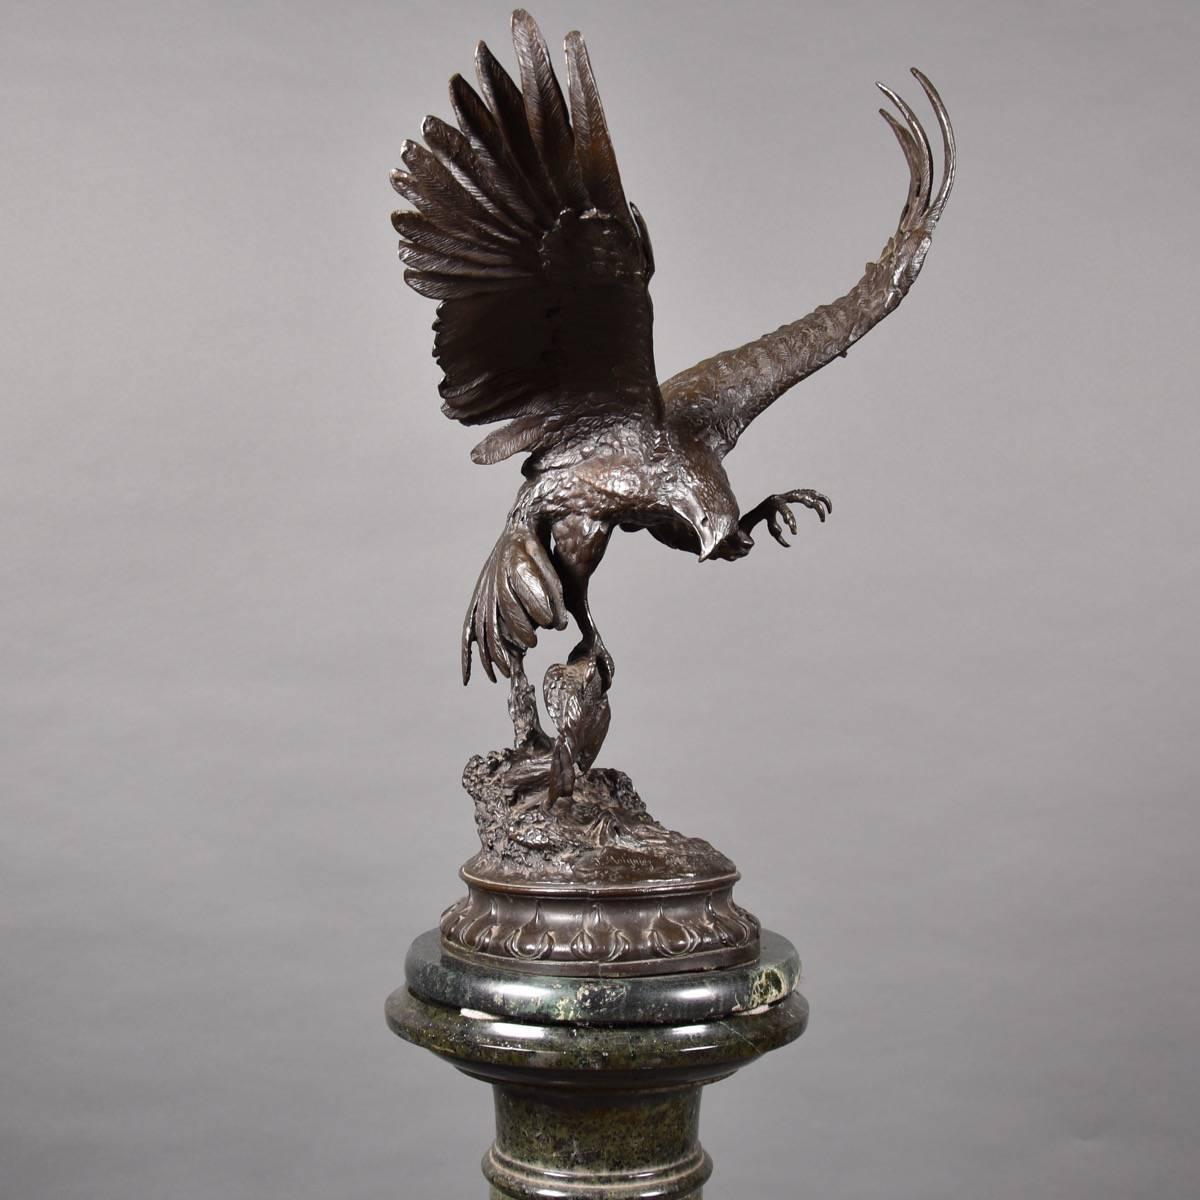 Vases Hunting Eagle Bronze Sculpture De Grande Bronze Fine Art